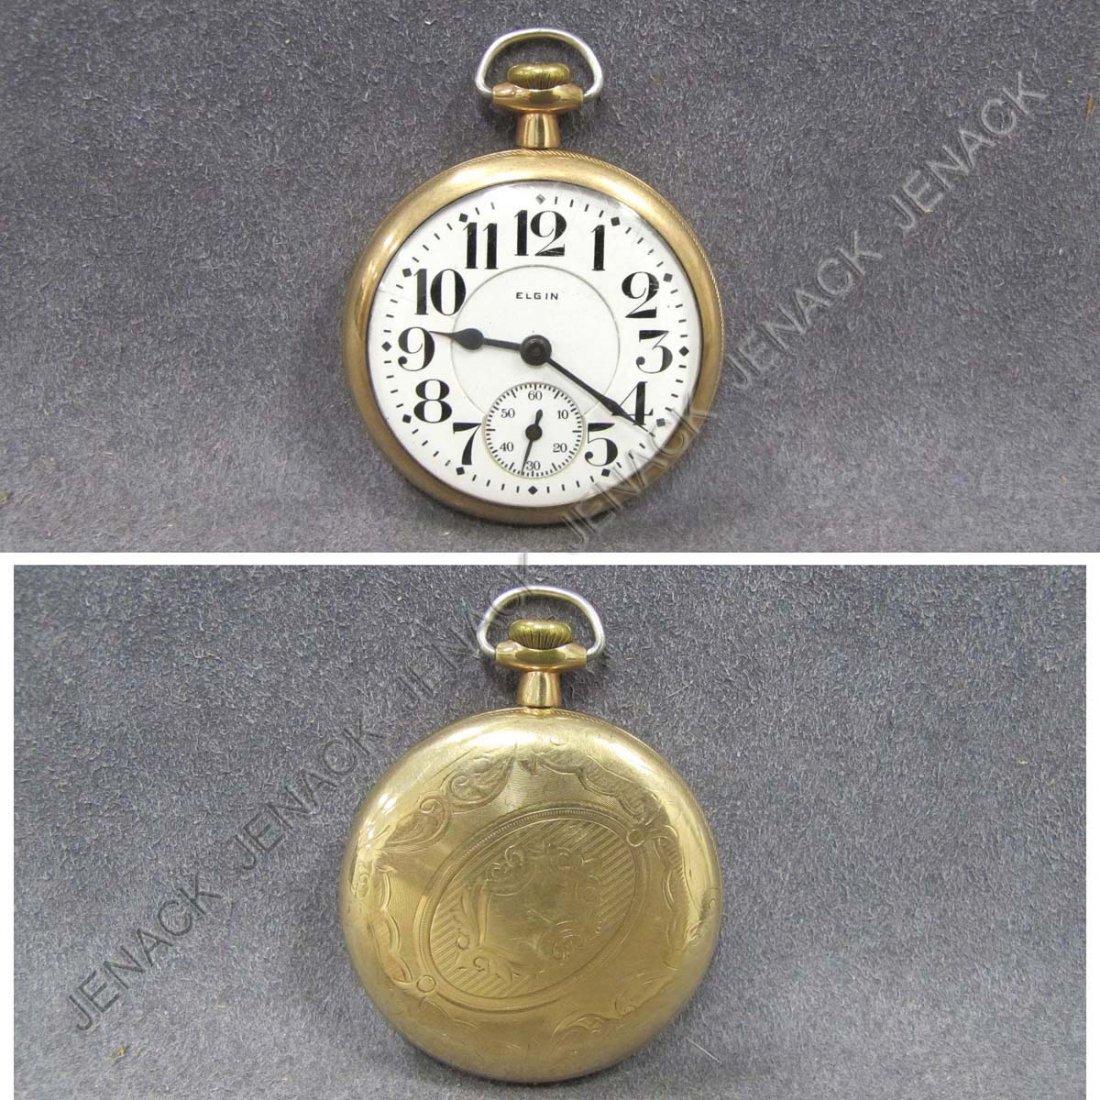 13: ELGIN/B.W. RAYMOND GOLD FILLED POCKET WATCH